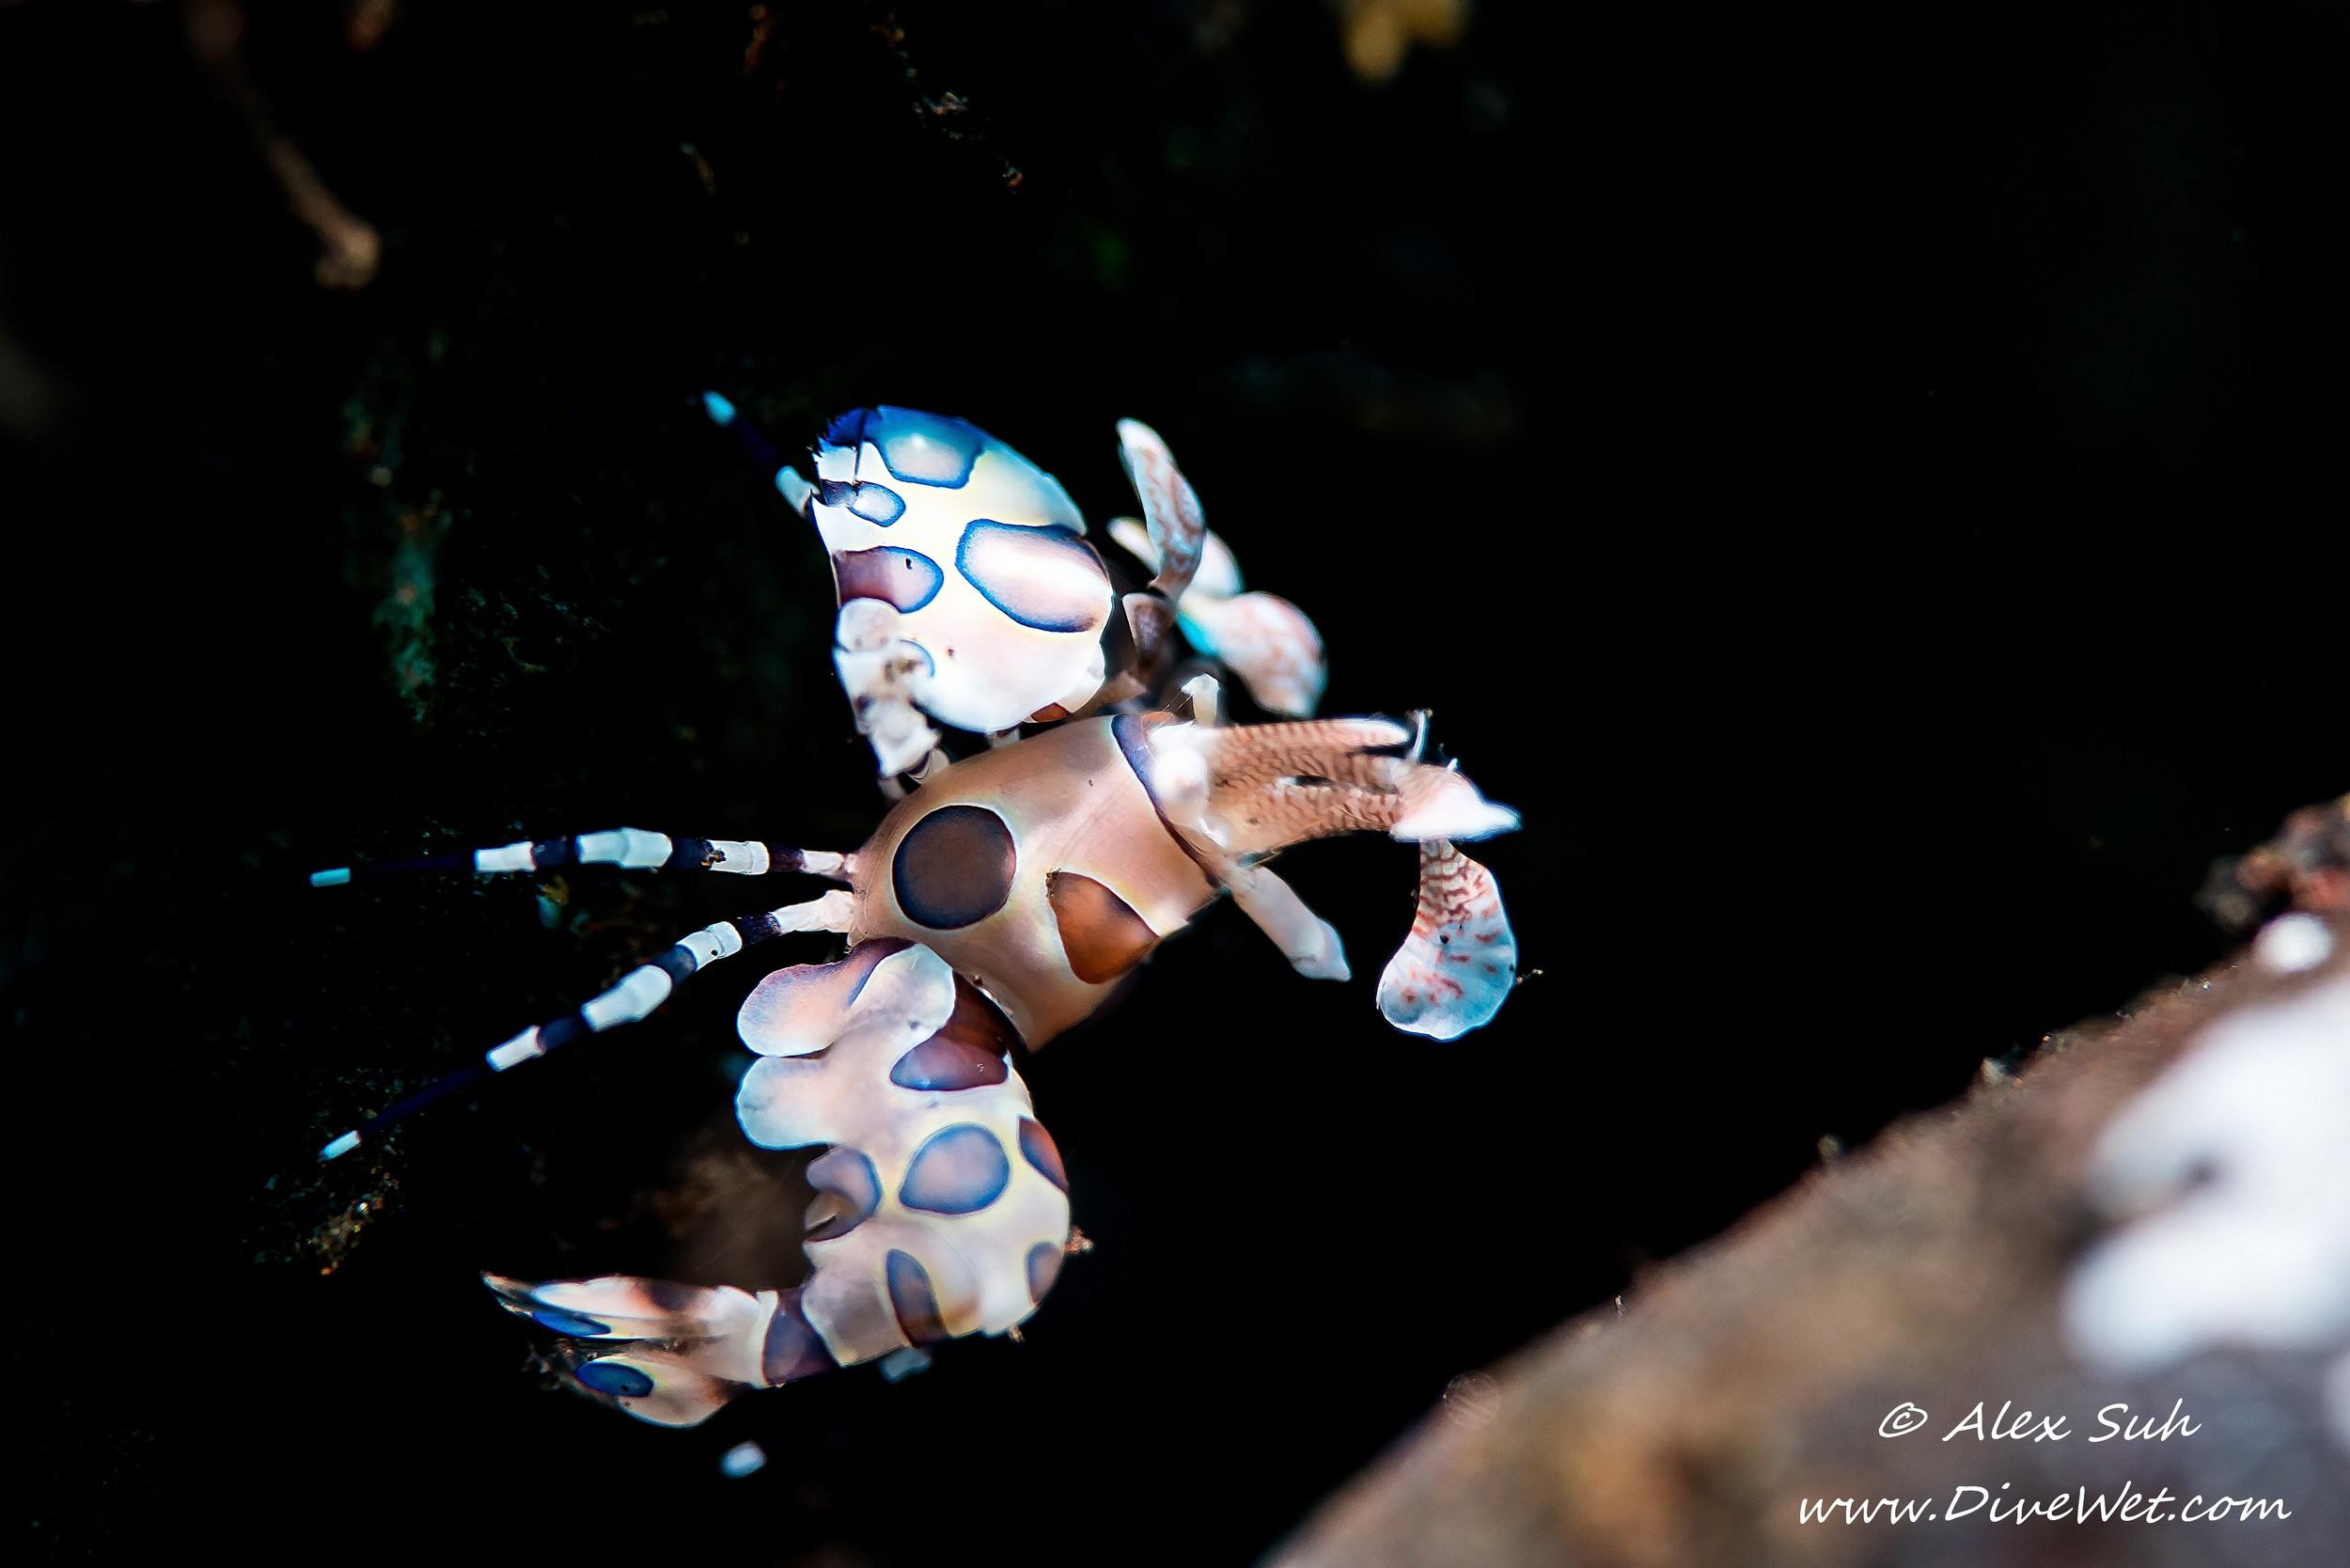 Harlequin Shrimp (Hymenocera picta)